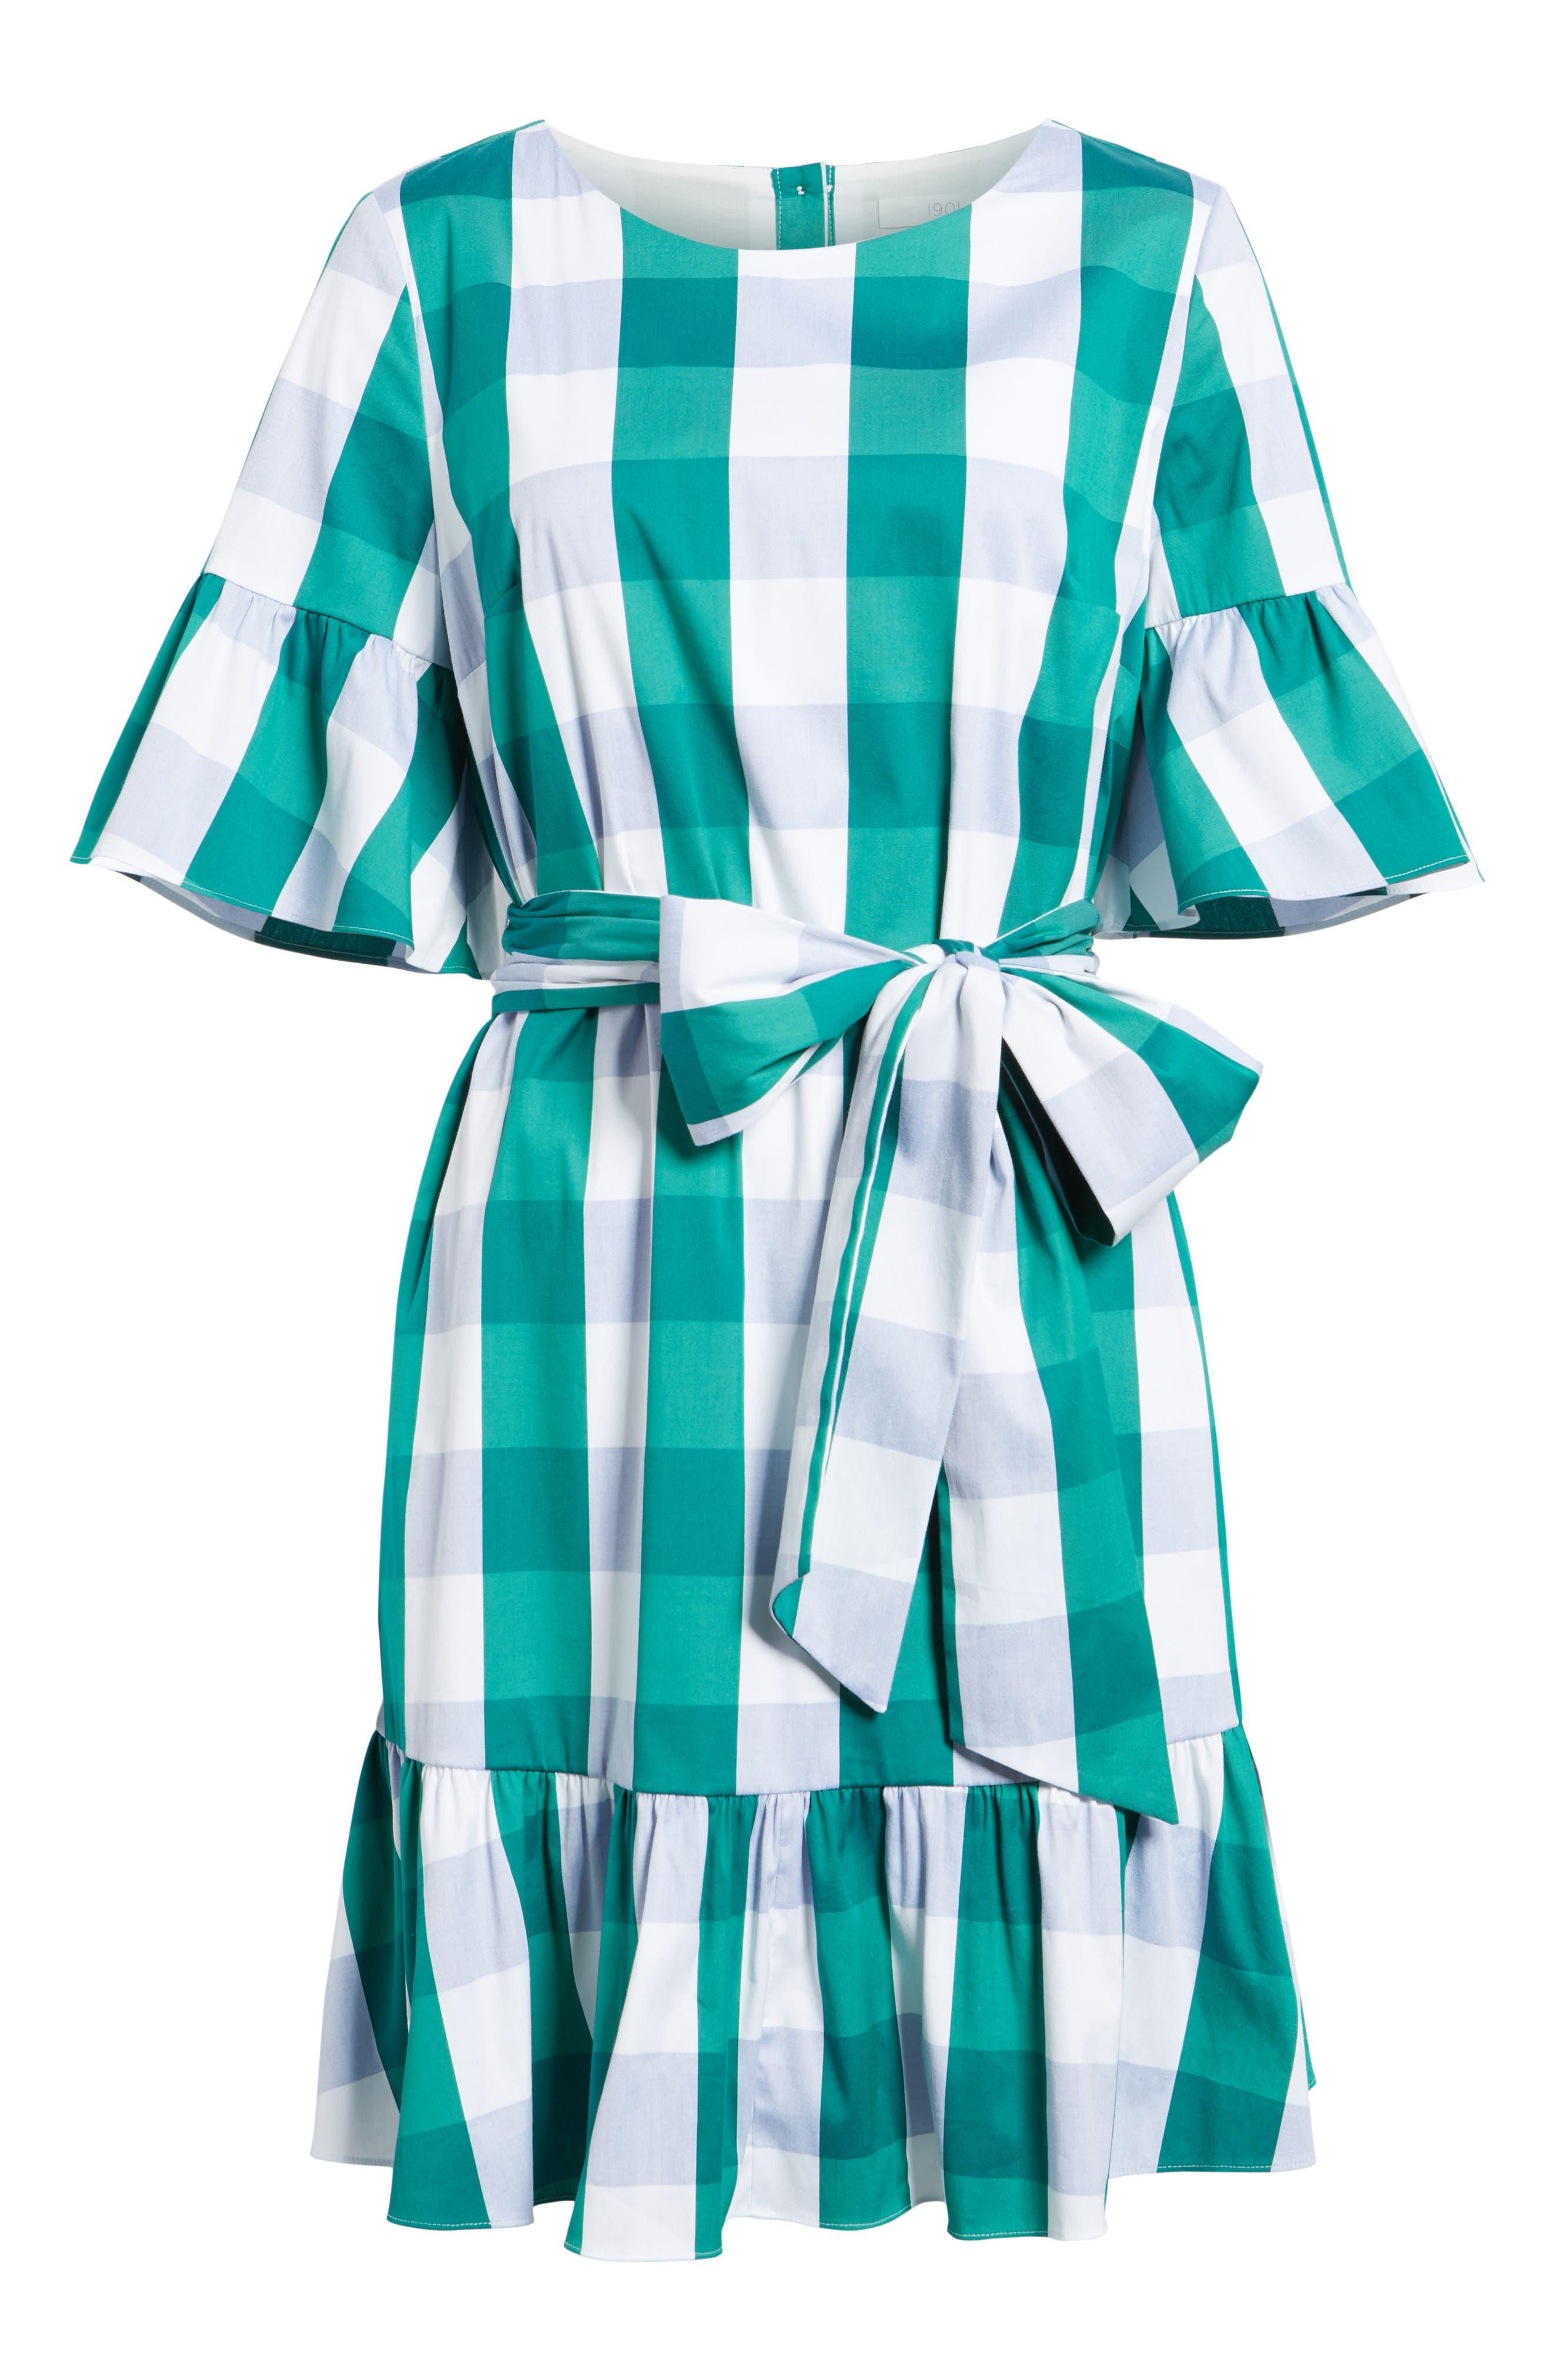 Ruffle & Bow Dress,                             Alternate thumbnail 7, color,                             Green- Blue Gingham